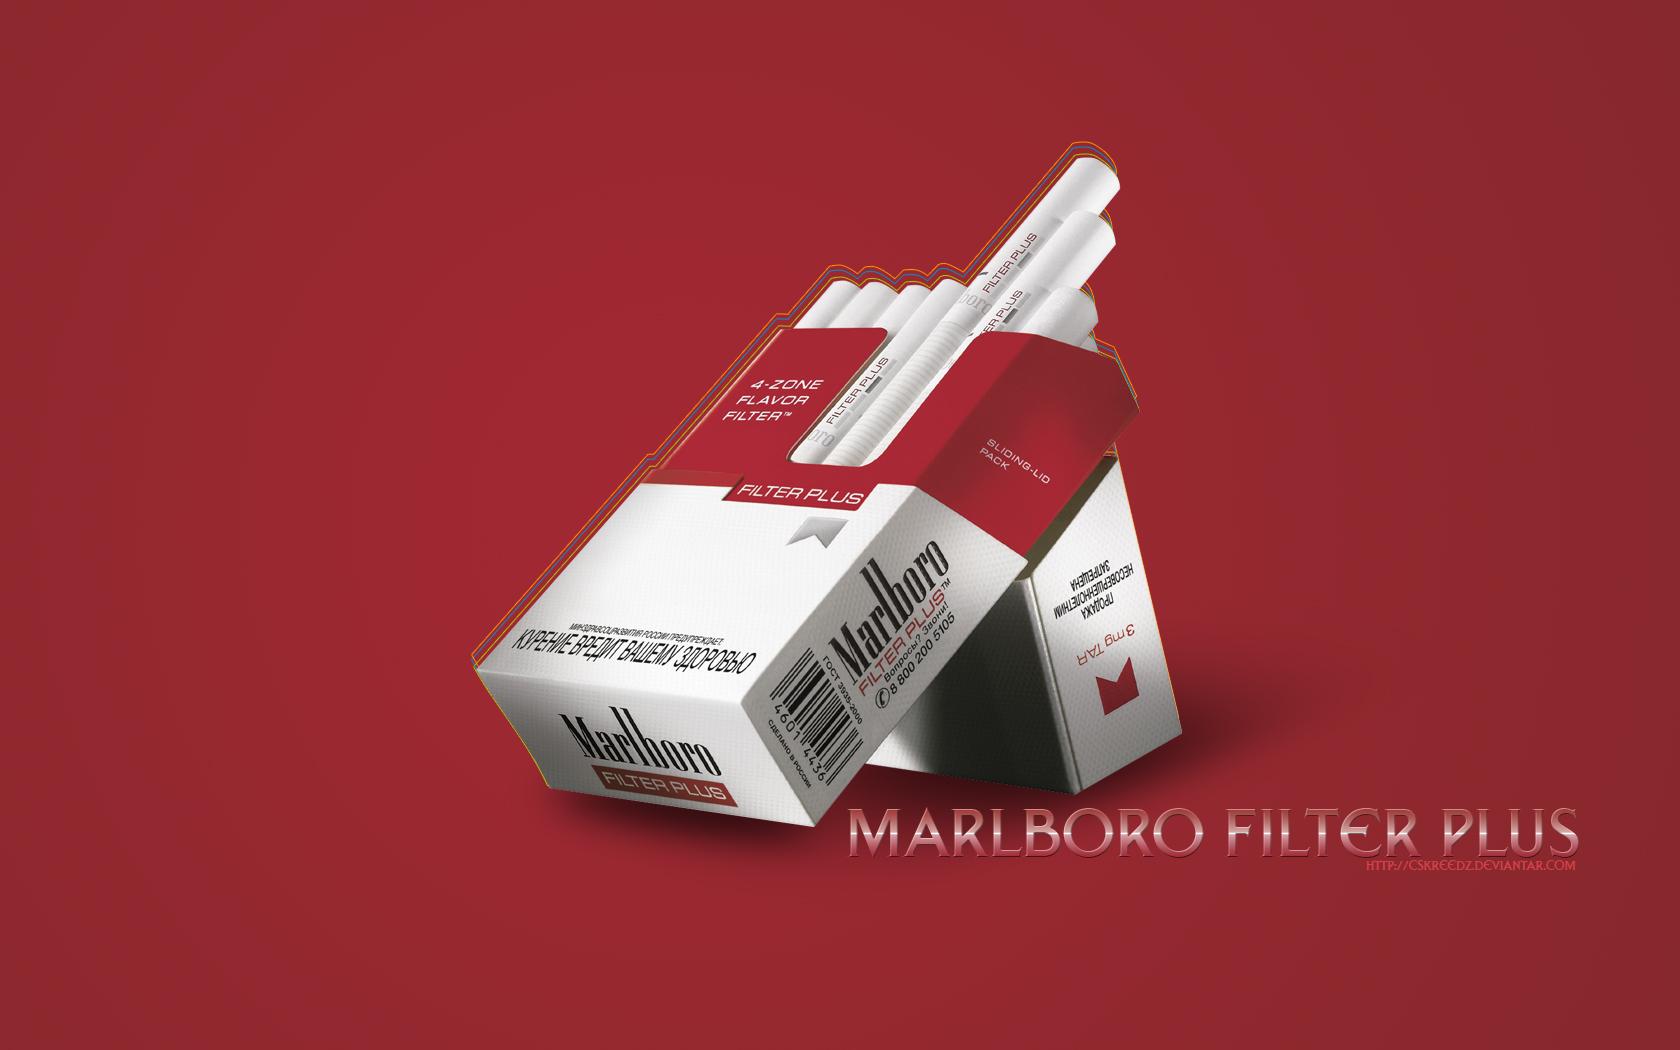 wallpaper marlboro filter plus by CsKreedz 1680x1050